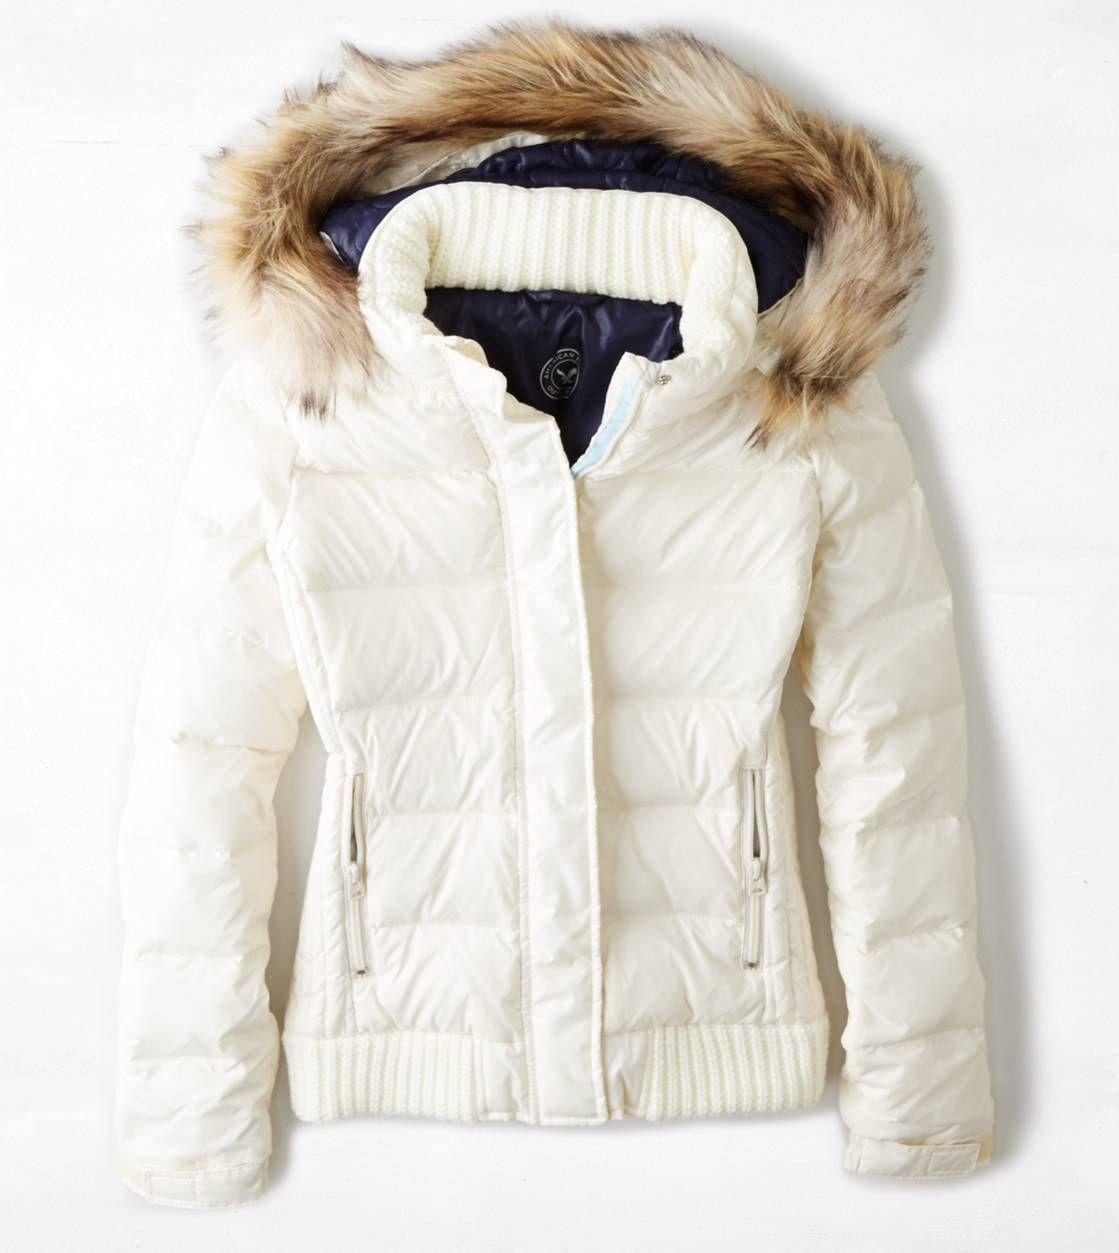 Ae Down Hooded Puffer Jacket Chalk American Eagle Outfitters Puffer Jacket Style Jackets Puffy Winter Jacket [ 1253 x 1119 Pixel ]